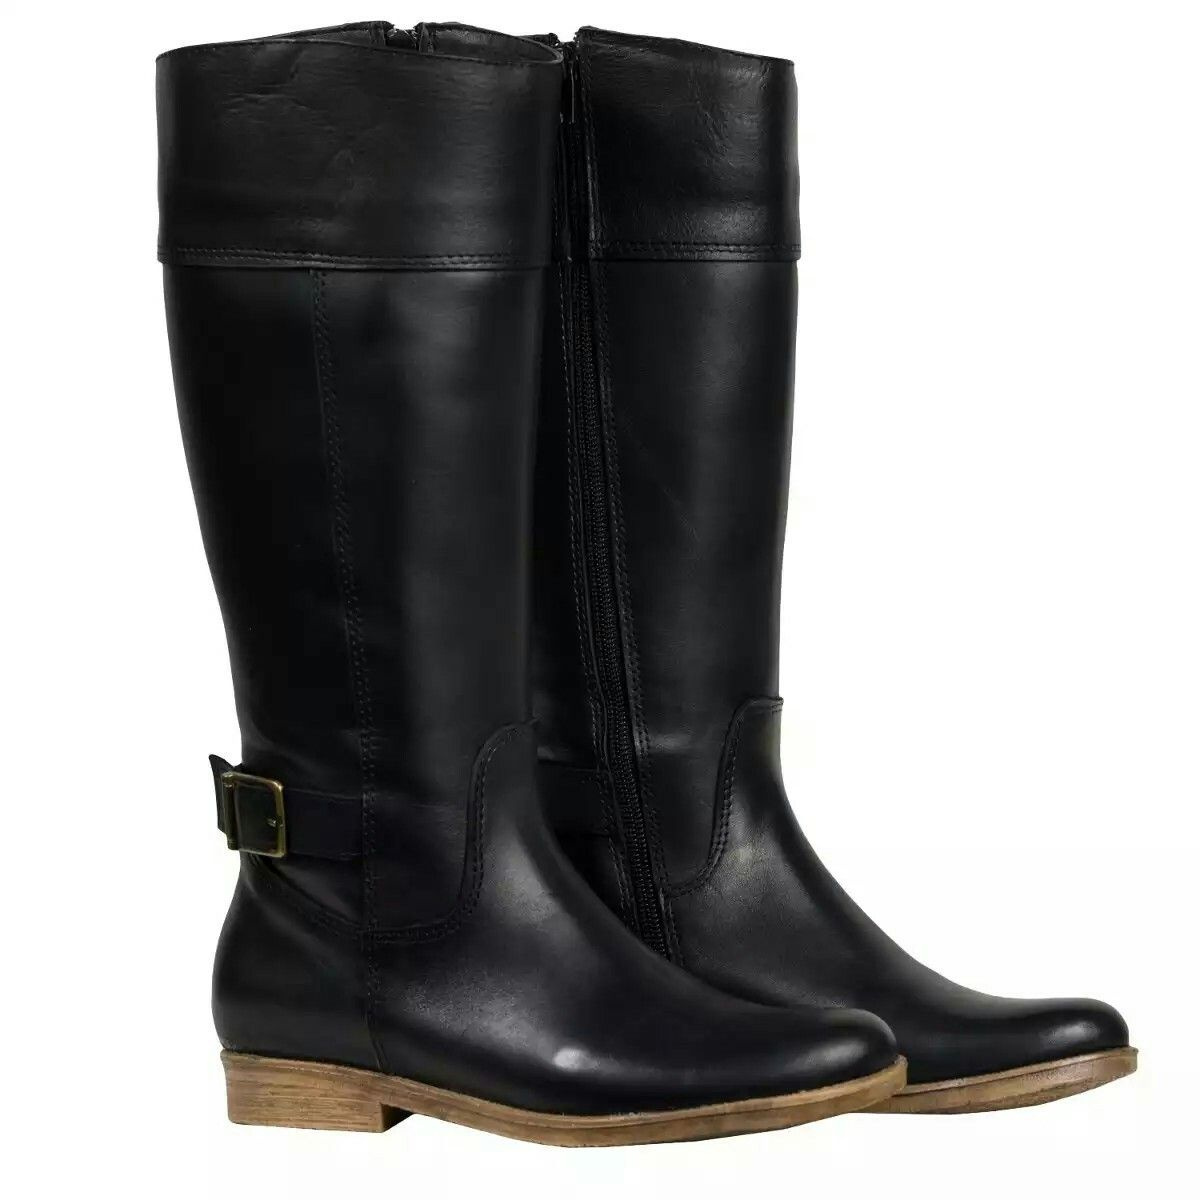 64ea25ea0 Botas Mujer Media Caña Zapatos Bota Montar Almacen De Cueros. Botas Largas